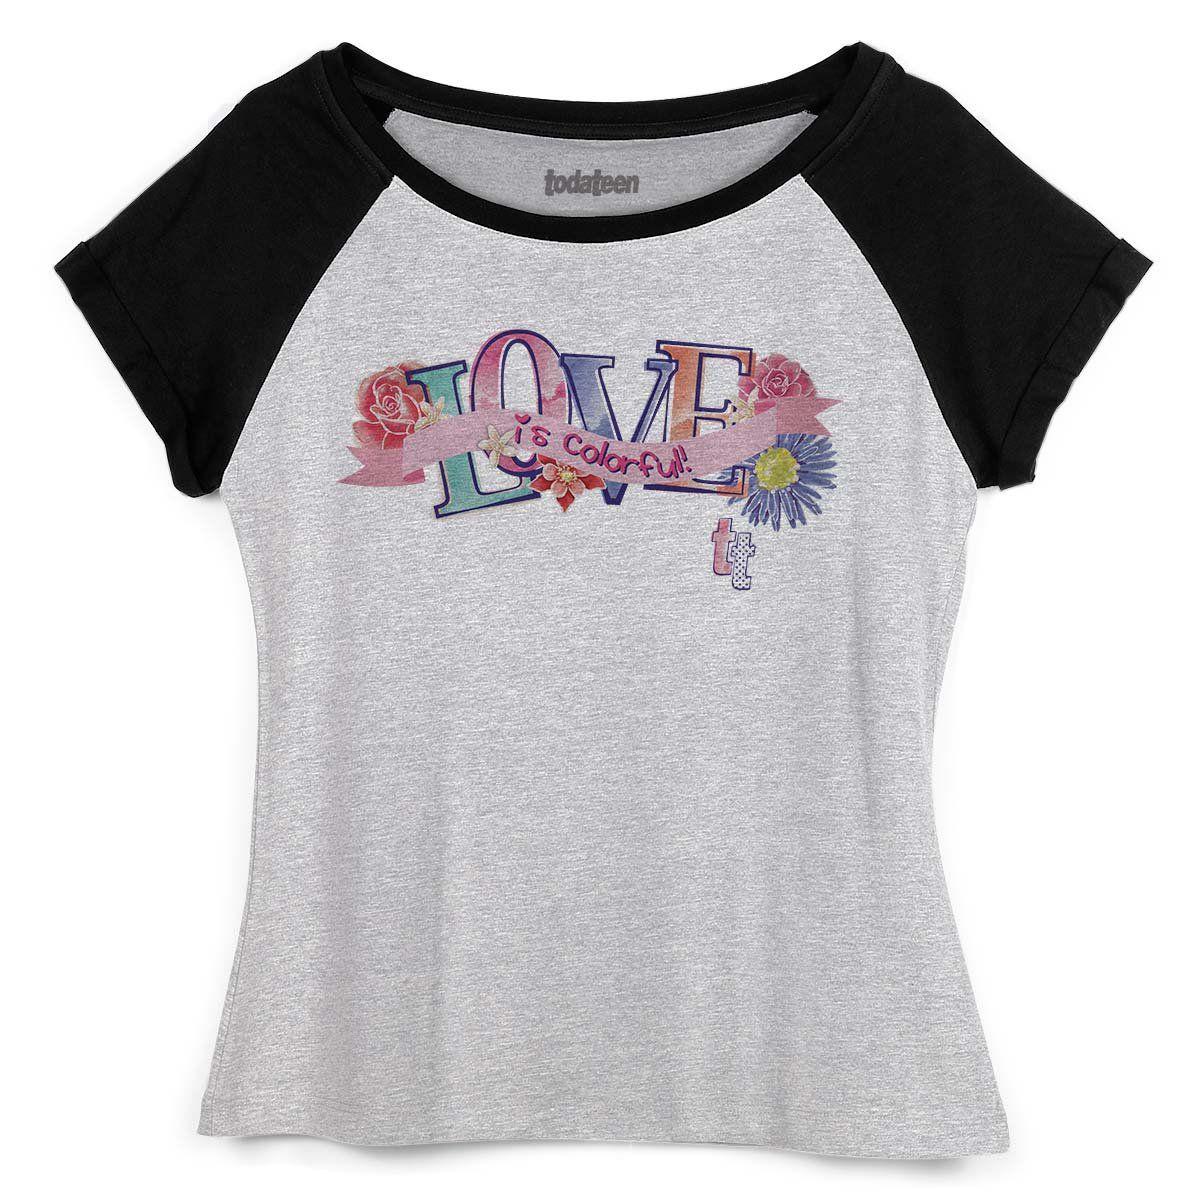 Camiseta Raglan Feminina TodaTeen Love is Colorful!  - bandUP Store Marketplace